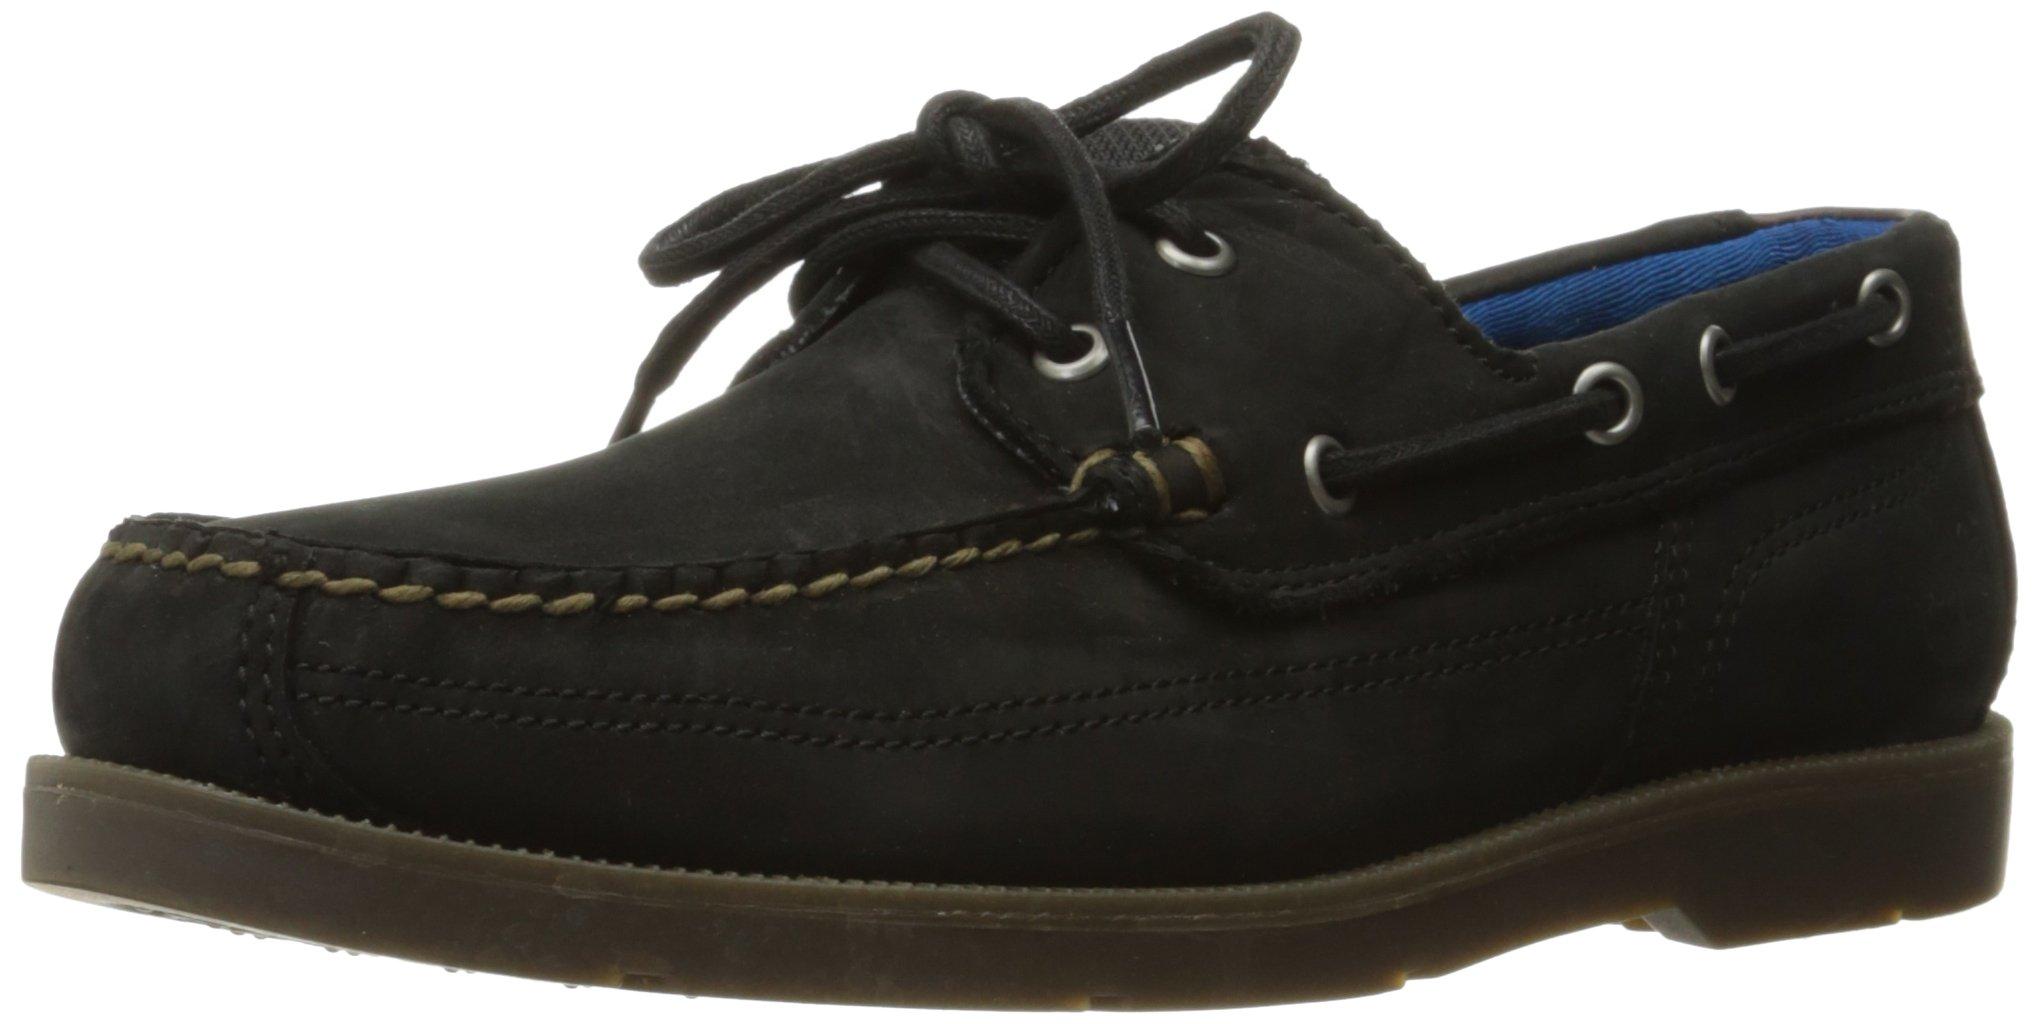 Timberland Men's Piper Cove Fg Boat Shoe, Jet Black Oiled Nubuck, 10.5 M US